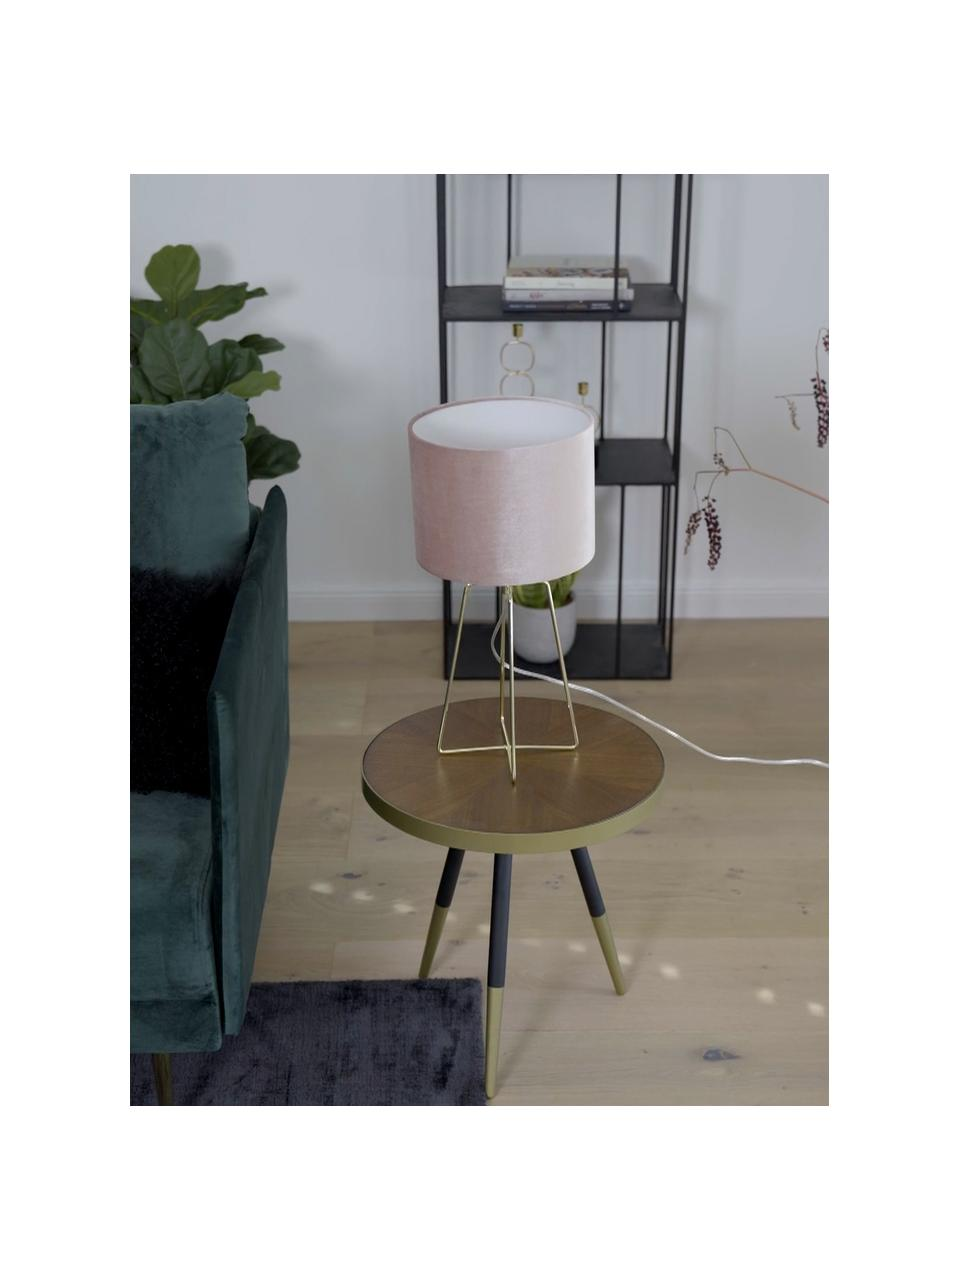 Samt-Tischlampe Karolina in Rosa, Lampenschirm: Samt, Lampenfuß: Metall, vermessingt, Altrosa Messing, glänzend Transparent, Ø 25 x H 49 cm